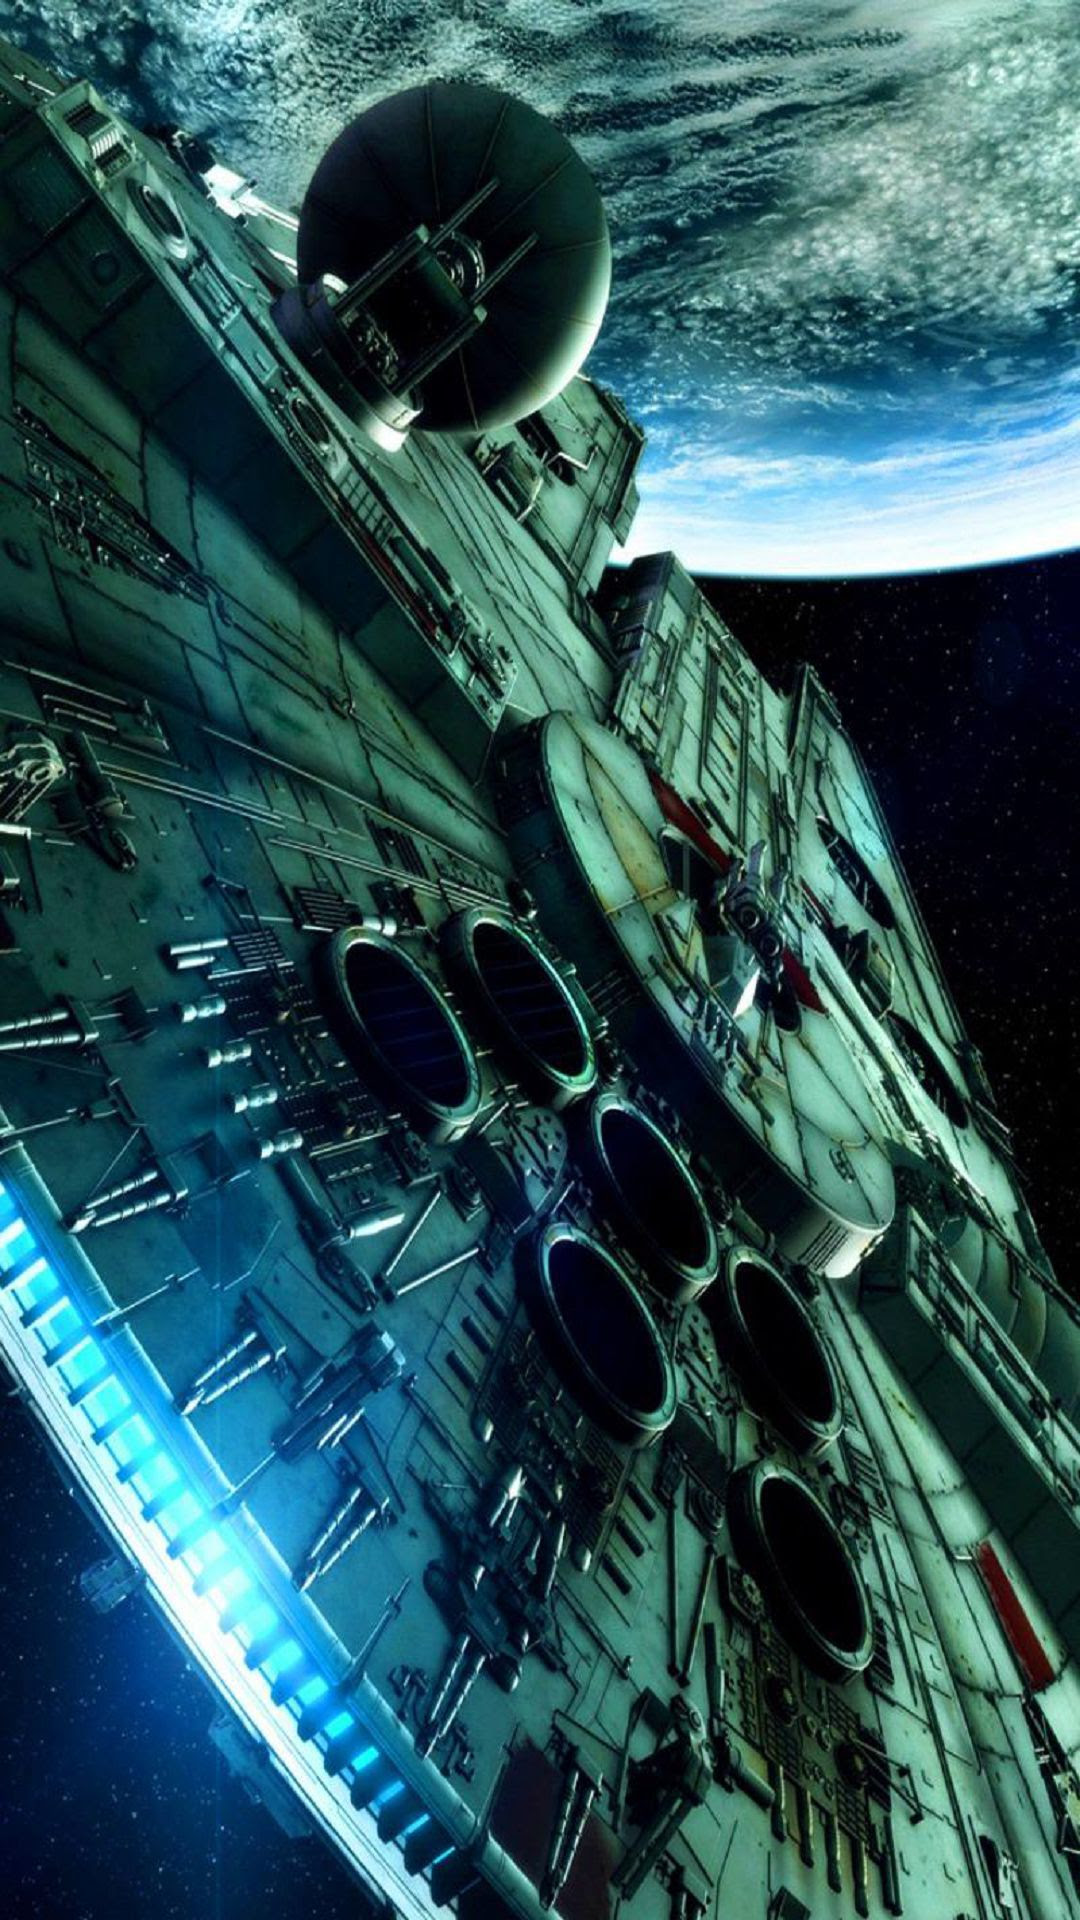 4k Star Wars Wallpaper Download Free Stunning Full Hd